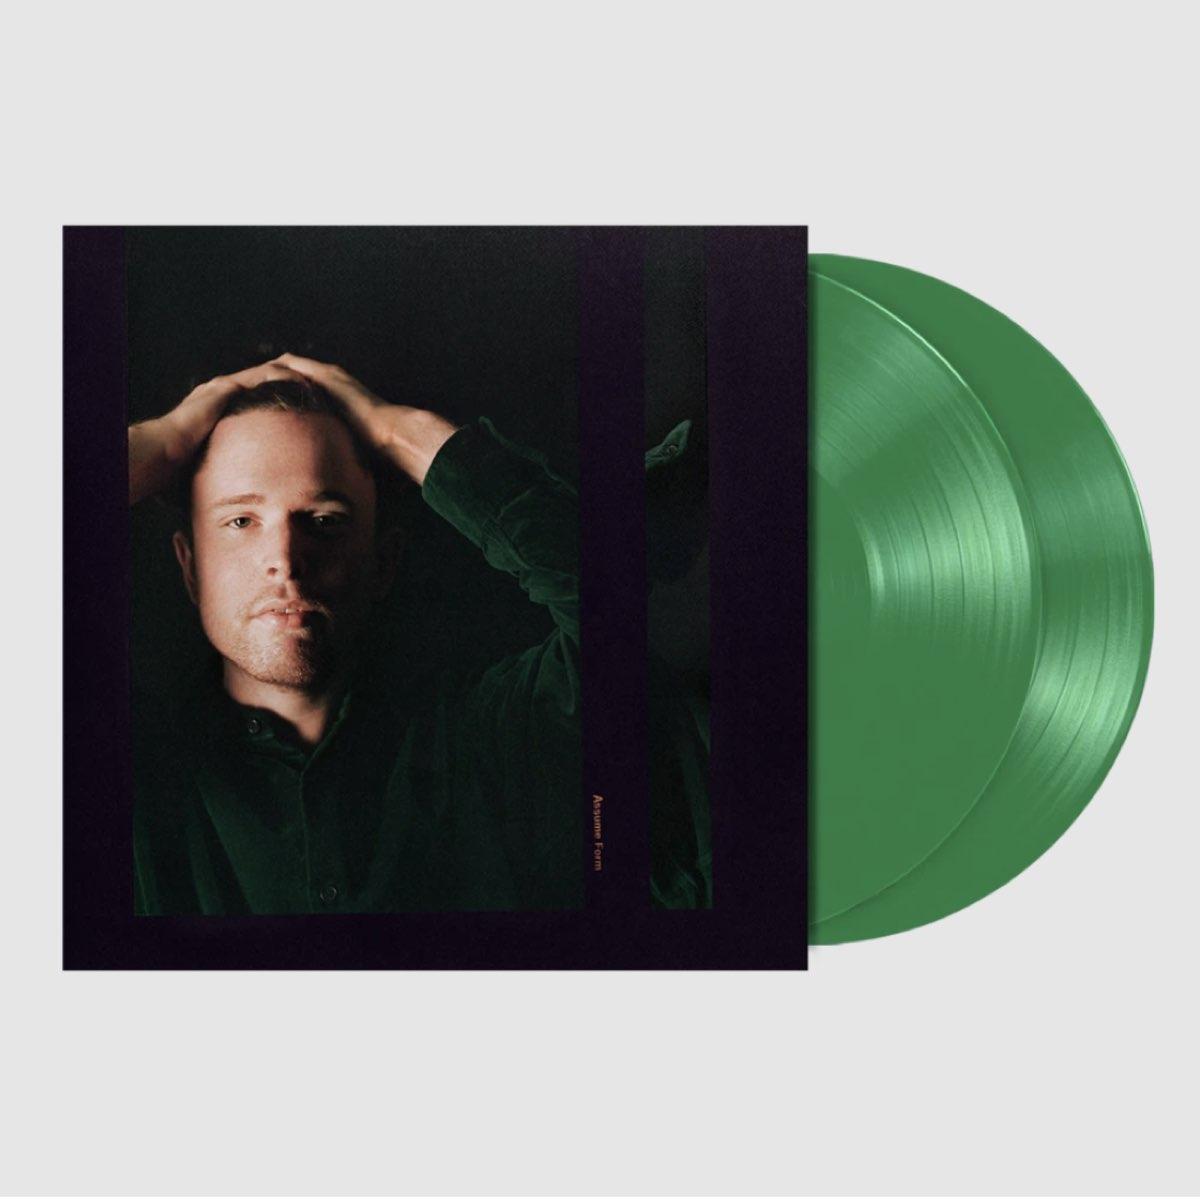 James Blake - Assume Form [Green Double Vinyl]